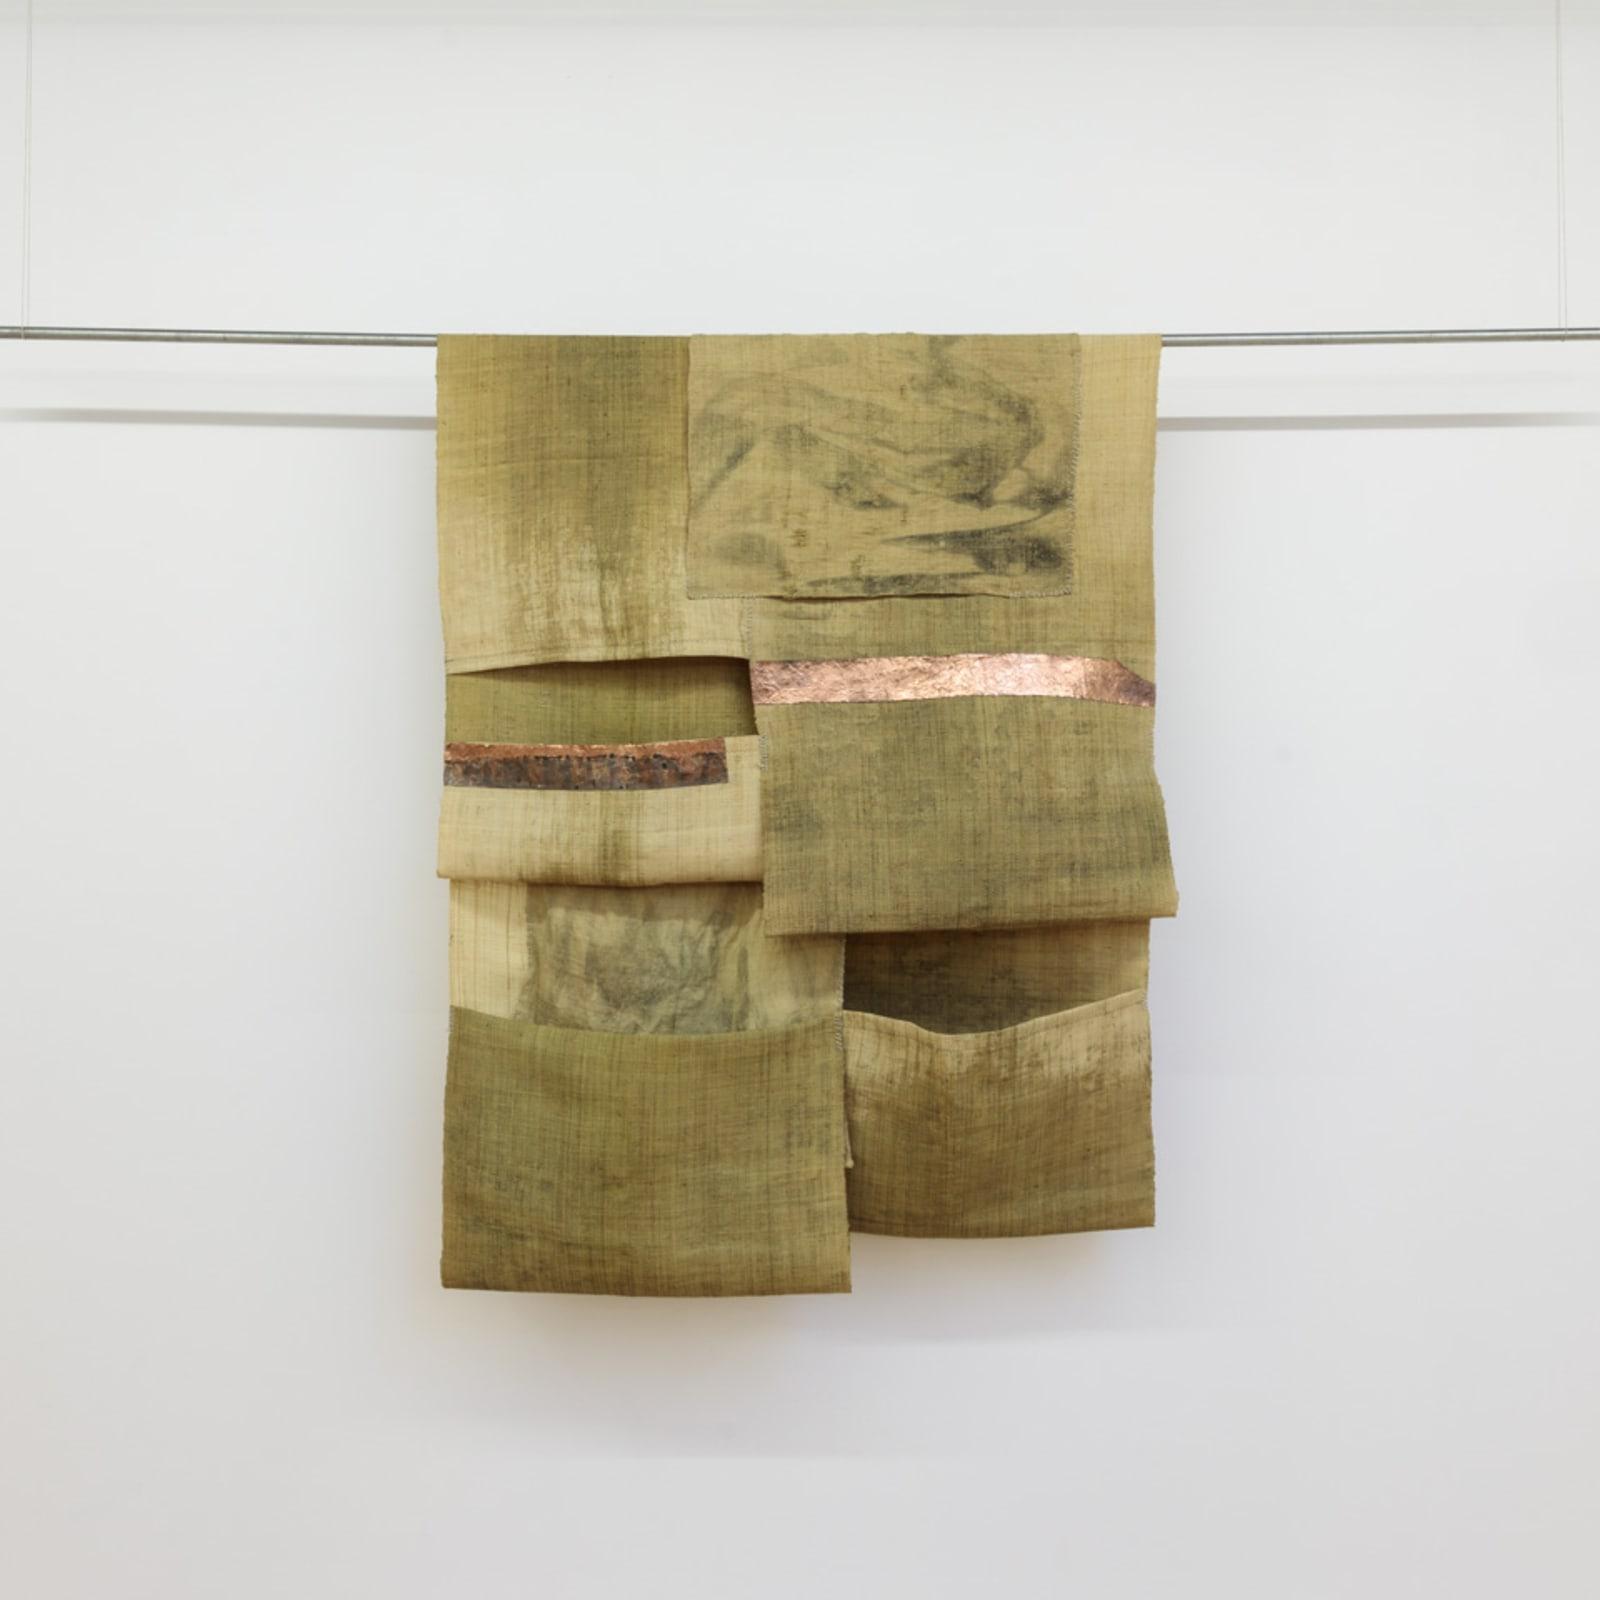 Tahir Carl Karmali  STRATA IV, 2018  raffia, cobalt, plastic, copper, graphite and lithium  137,2 x 104,1 cm